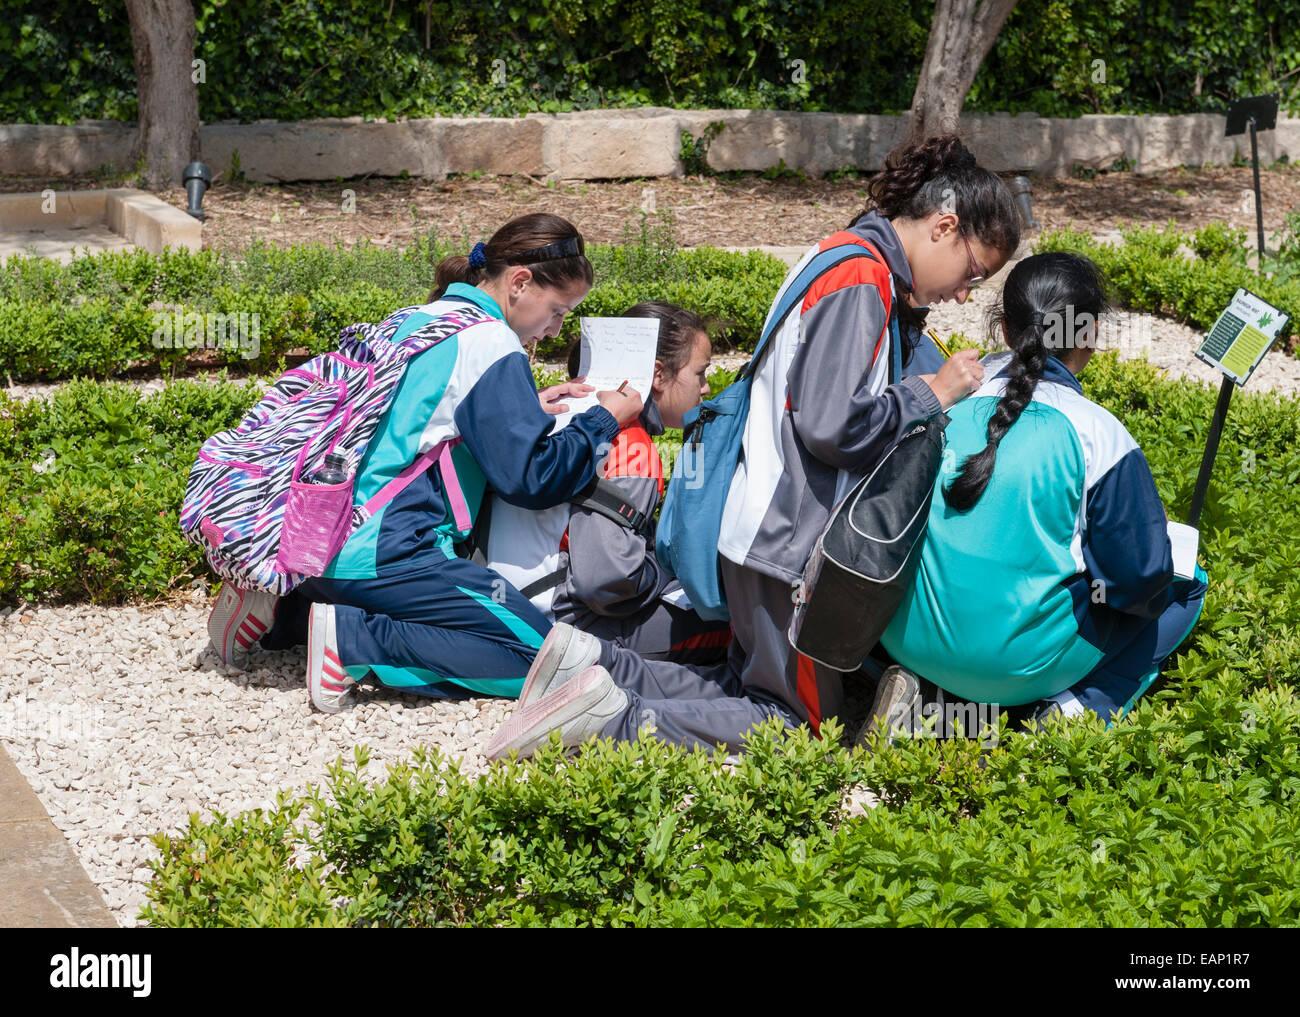 The President's Kitchen Garden, Attard, Malta. Schoolchildren on a botany study trip writing while leaning on - Stock Image